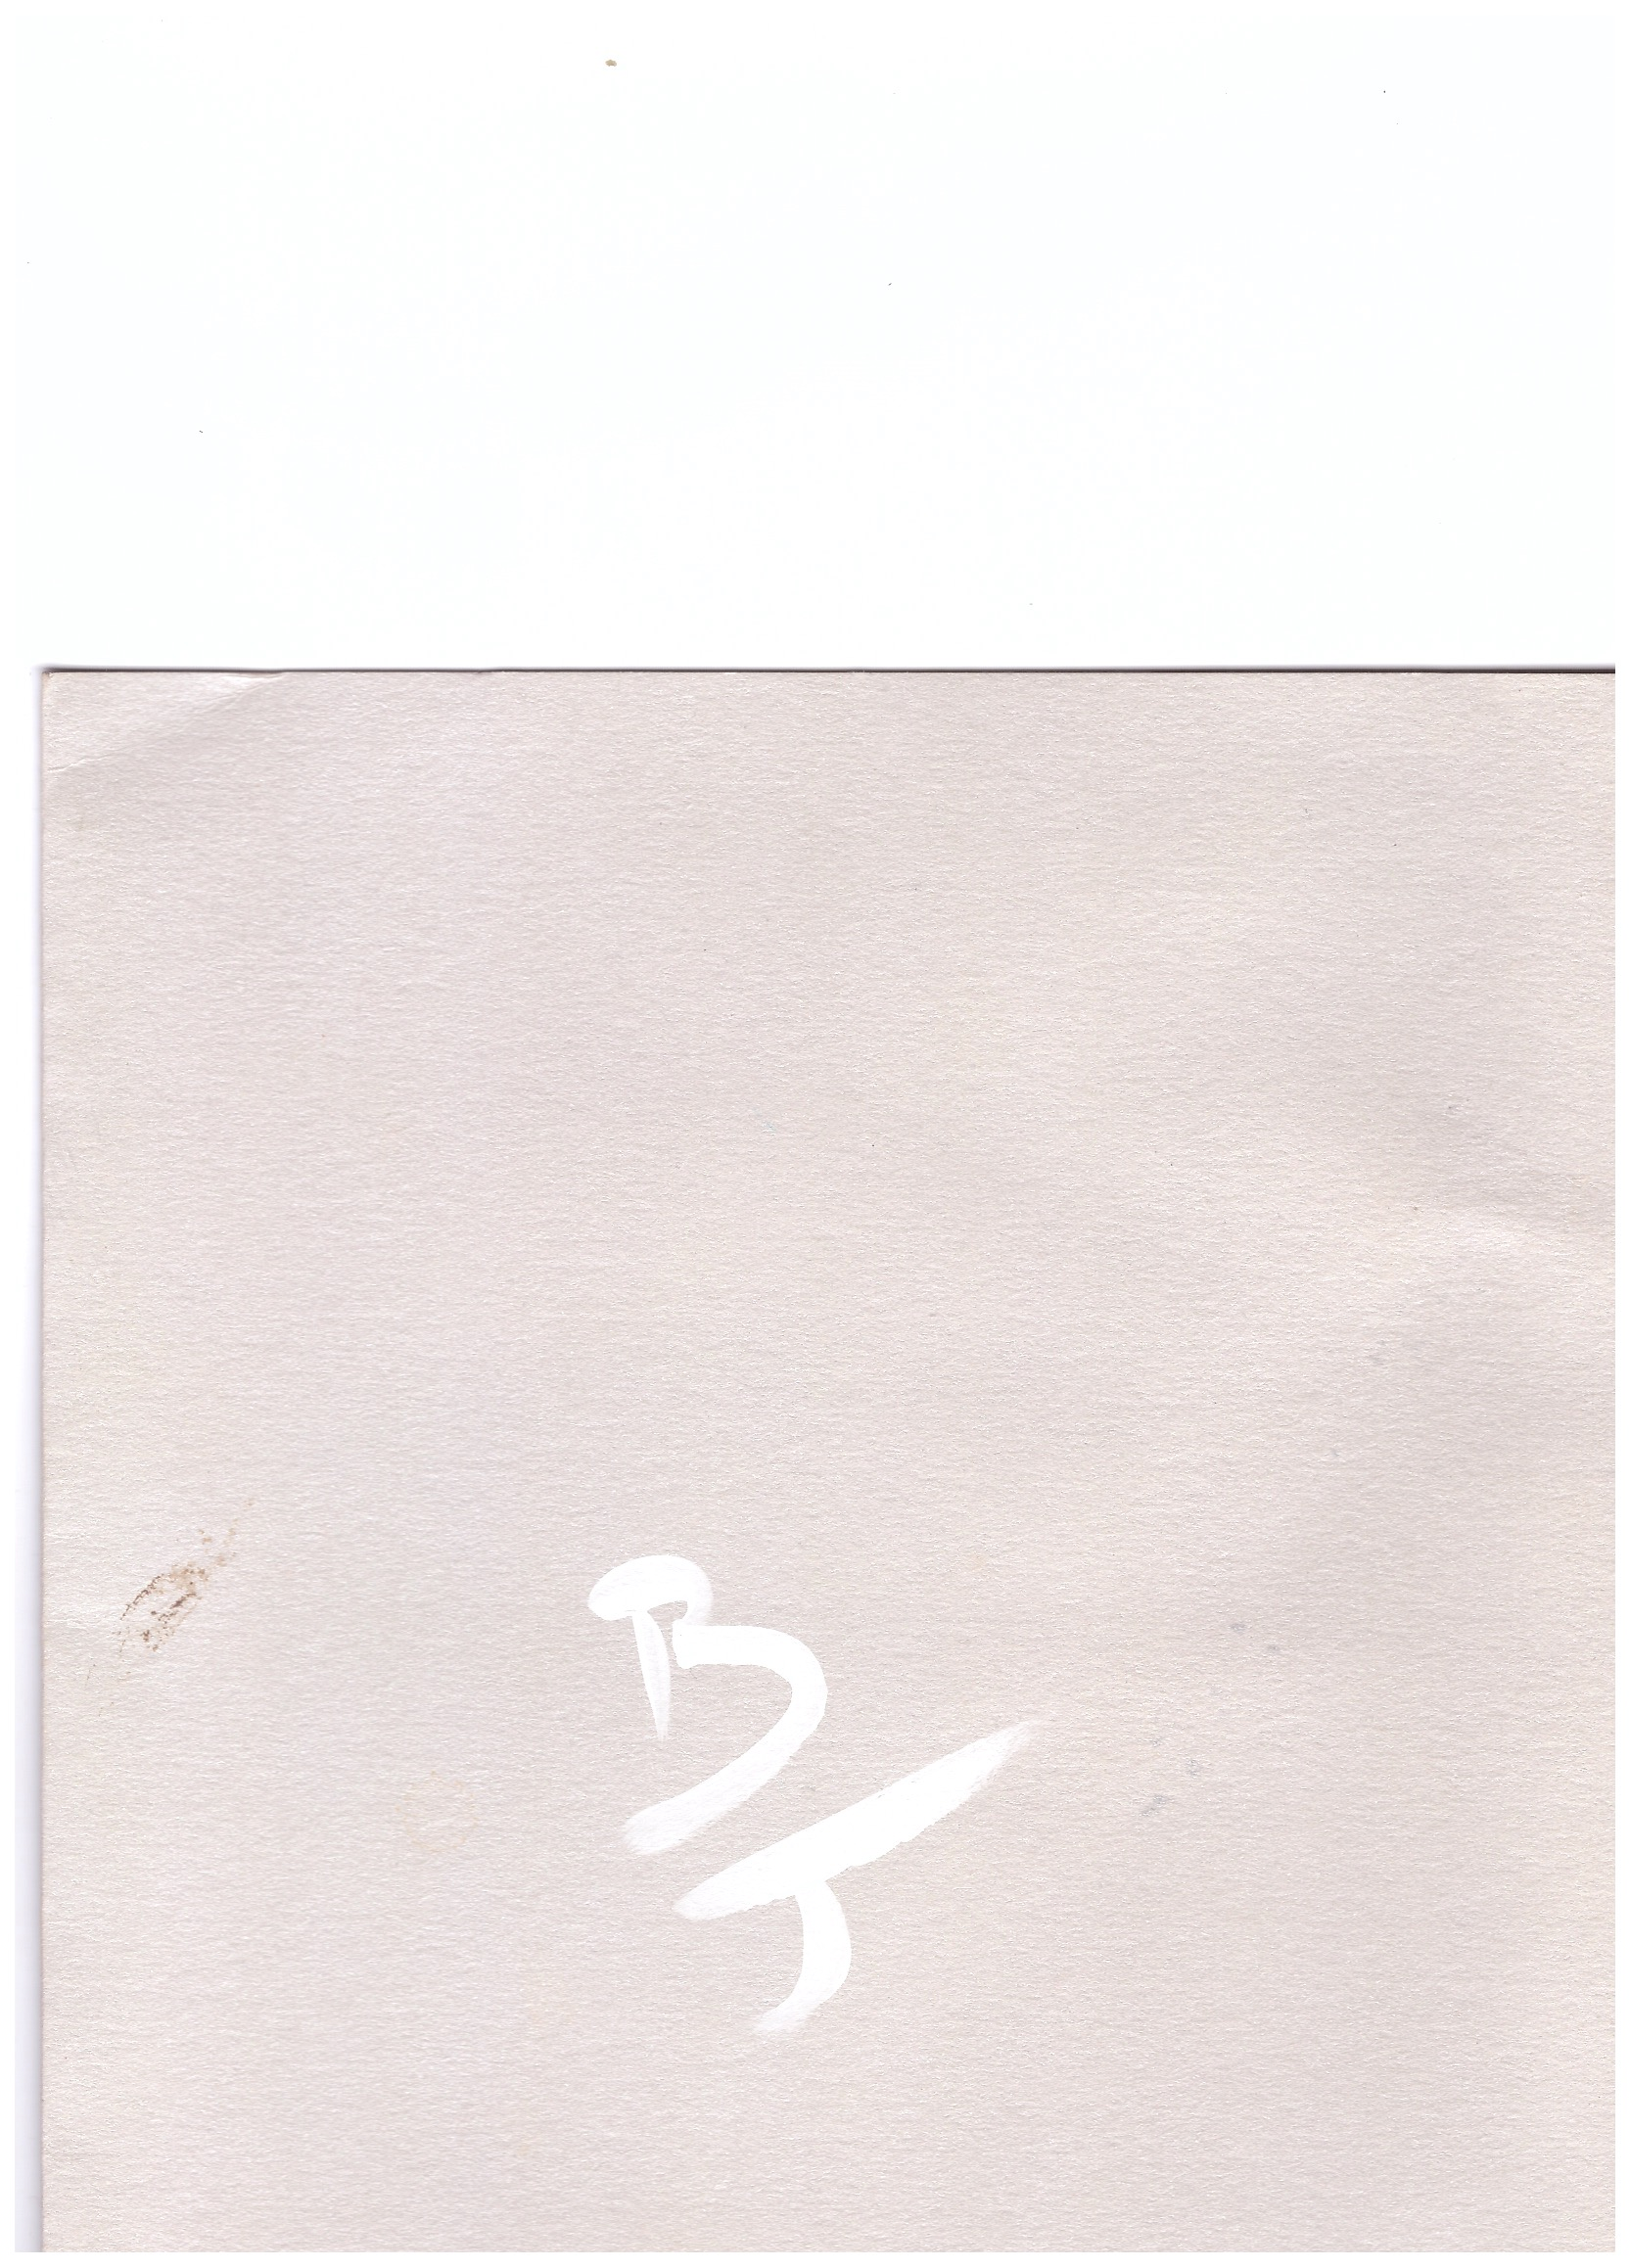 2007 BJ